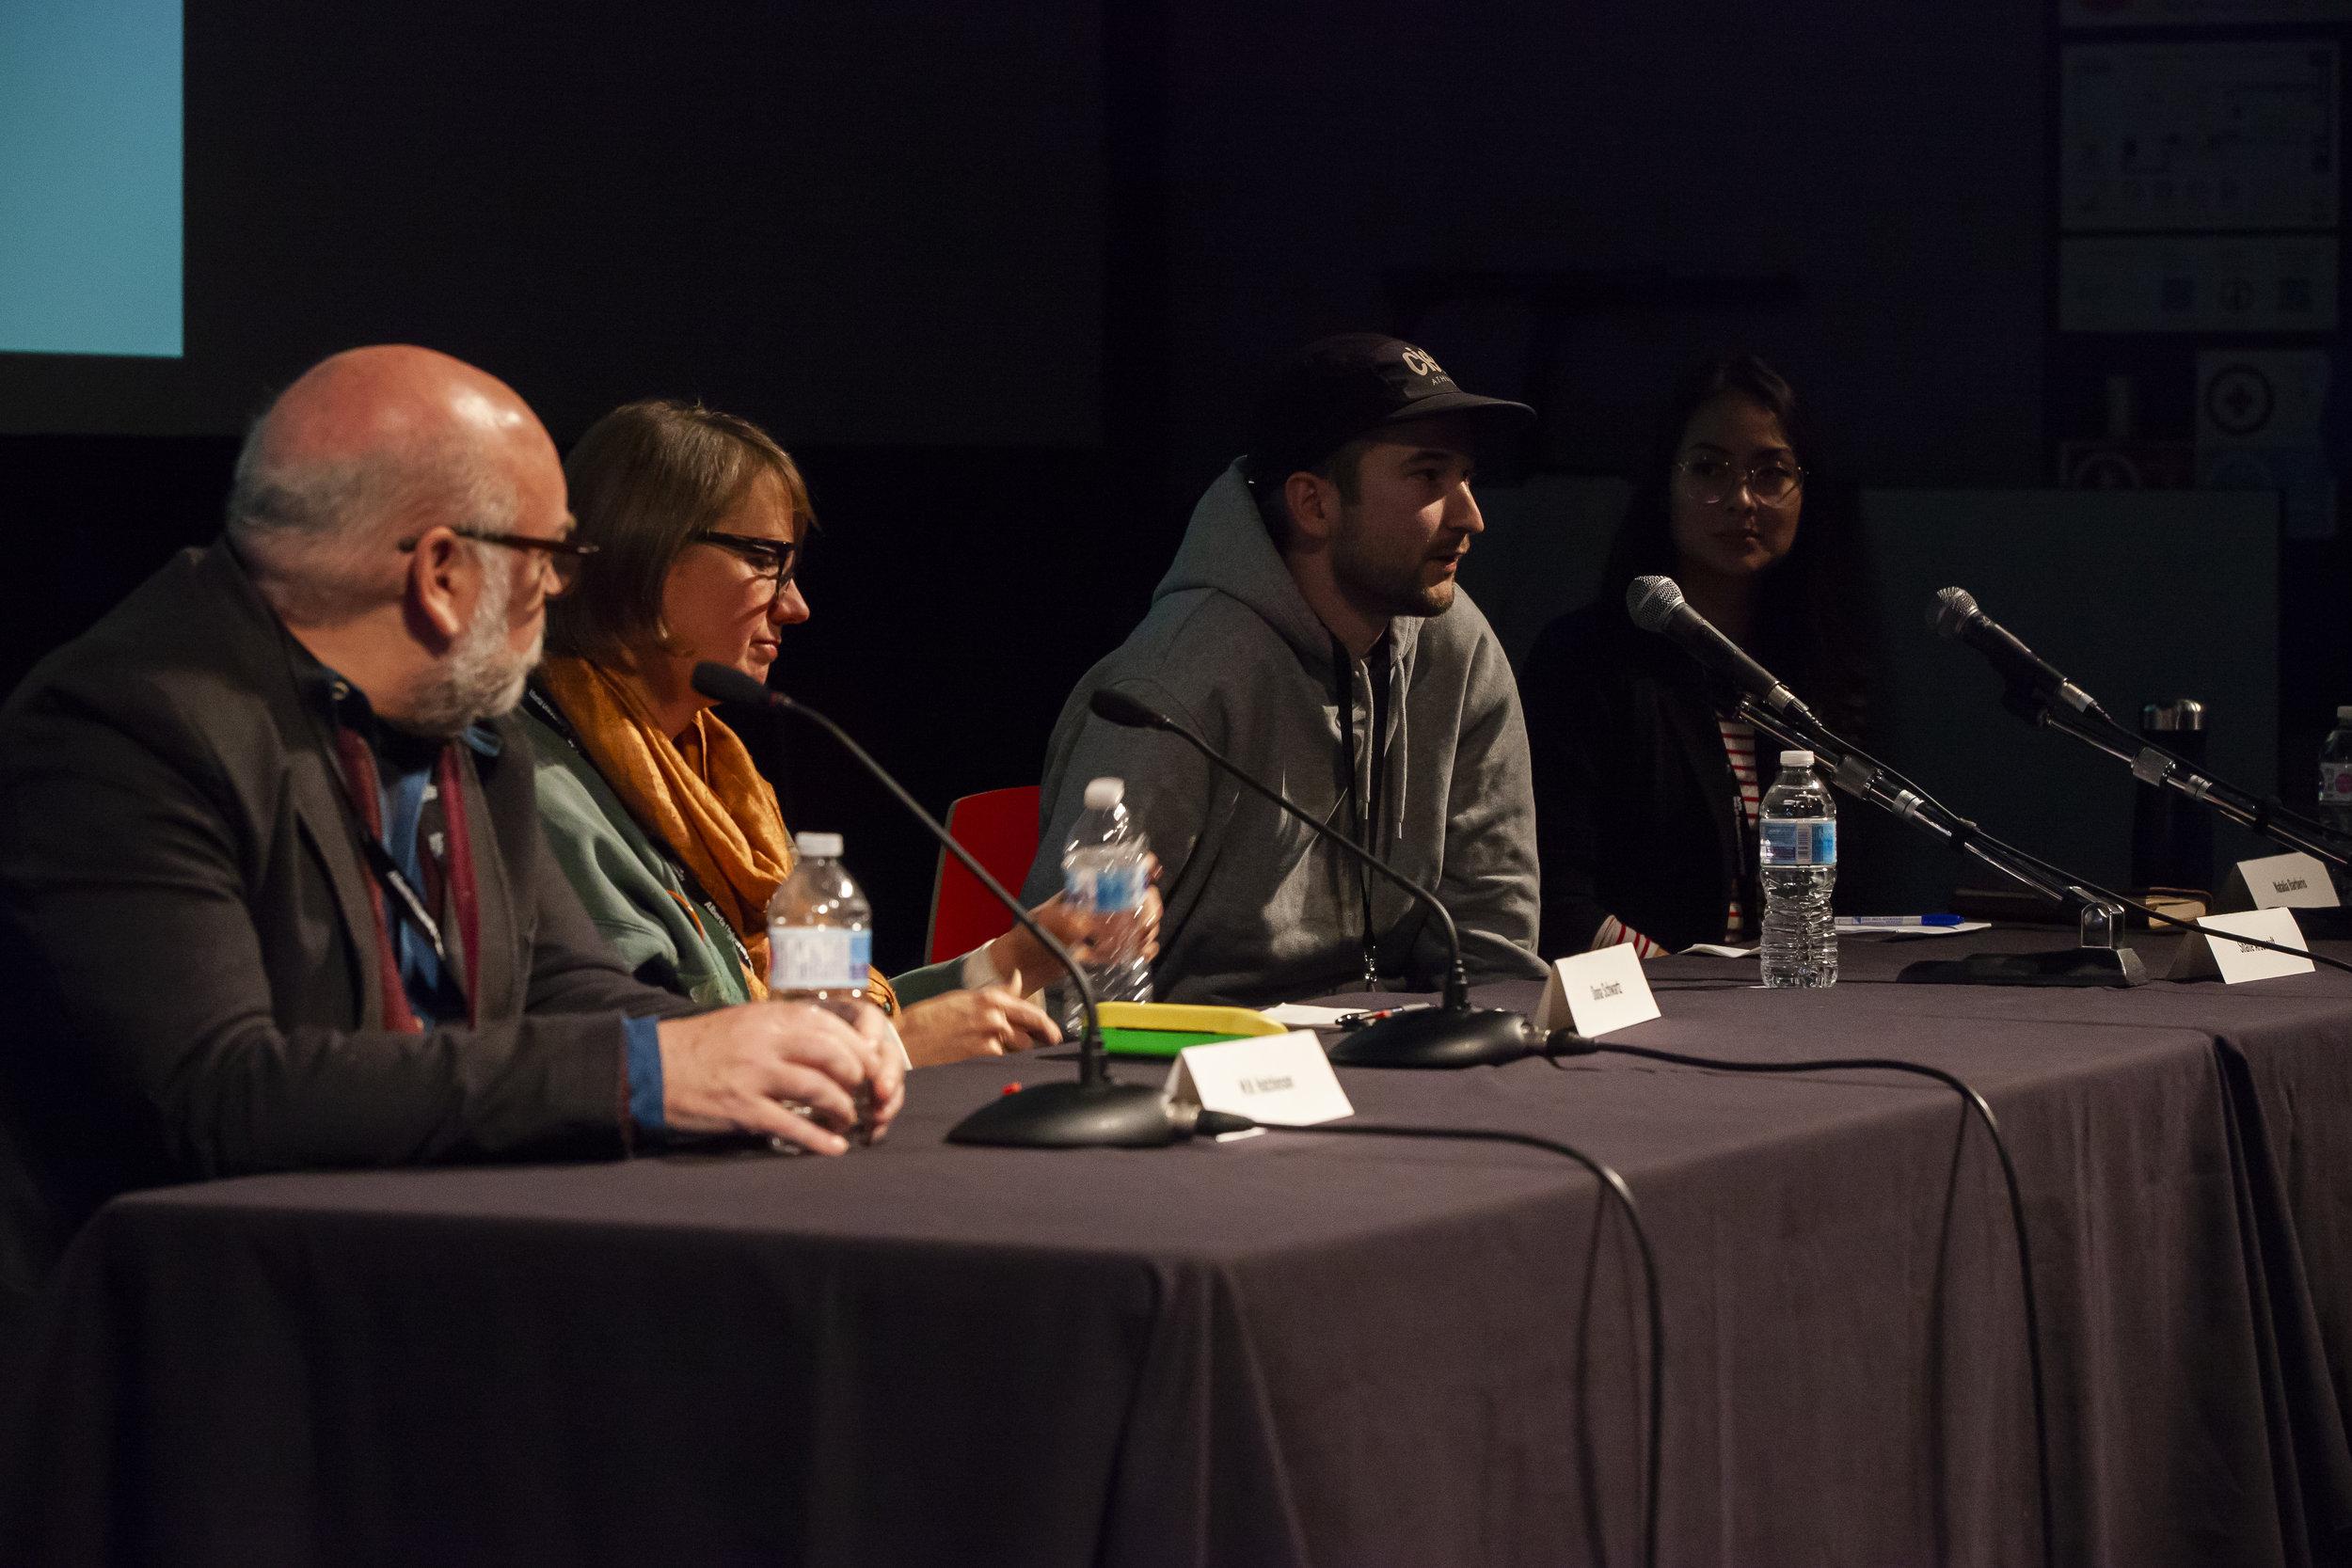 M.N Hutchinson, Dona Schwartz, Shane Arsenault & Natalia Barberis.